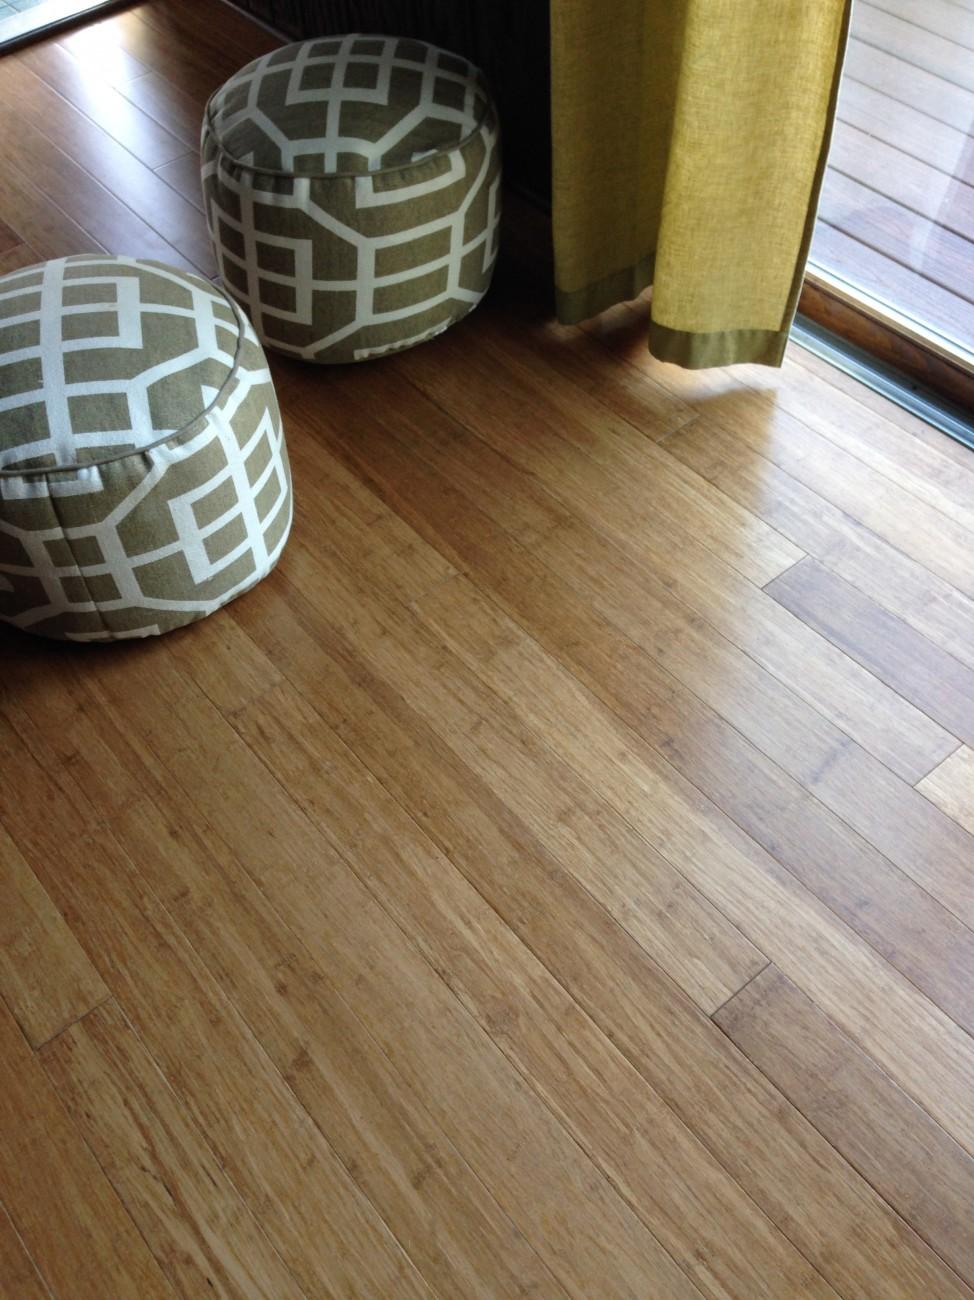 Bamboo flooring gallery eco friendly flooring for Eco friendly bamboo flooring